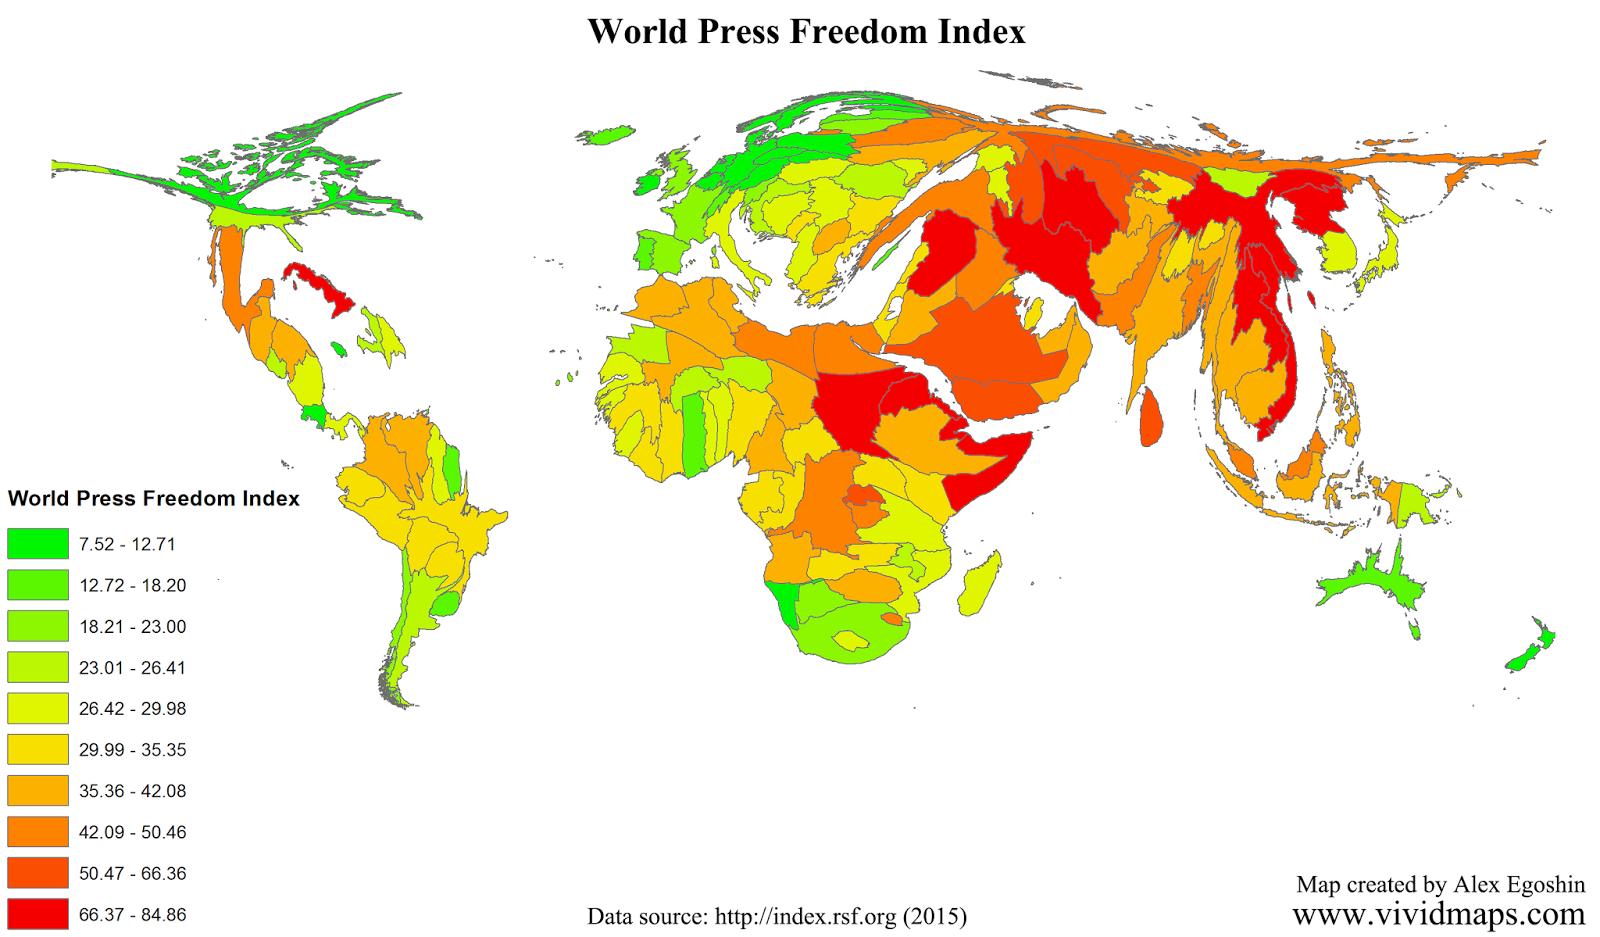 World Press Freedom Index 2015